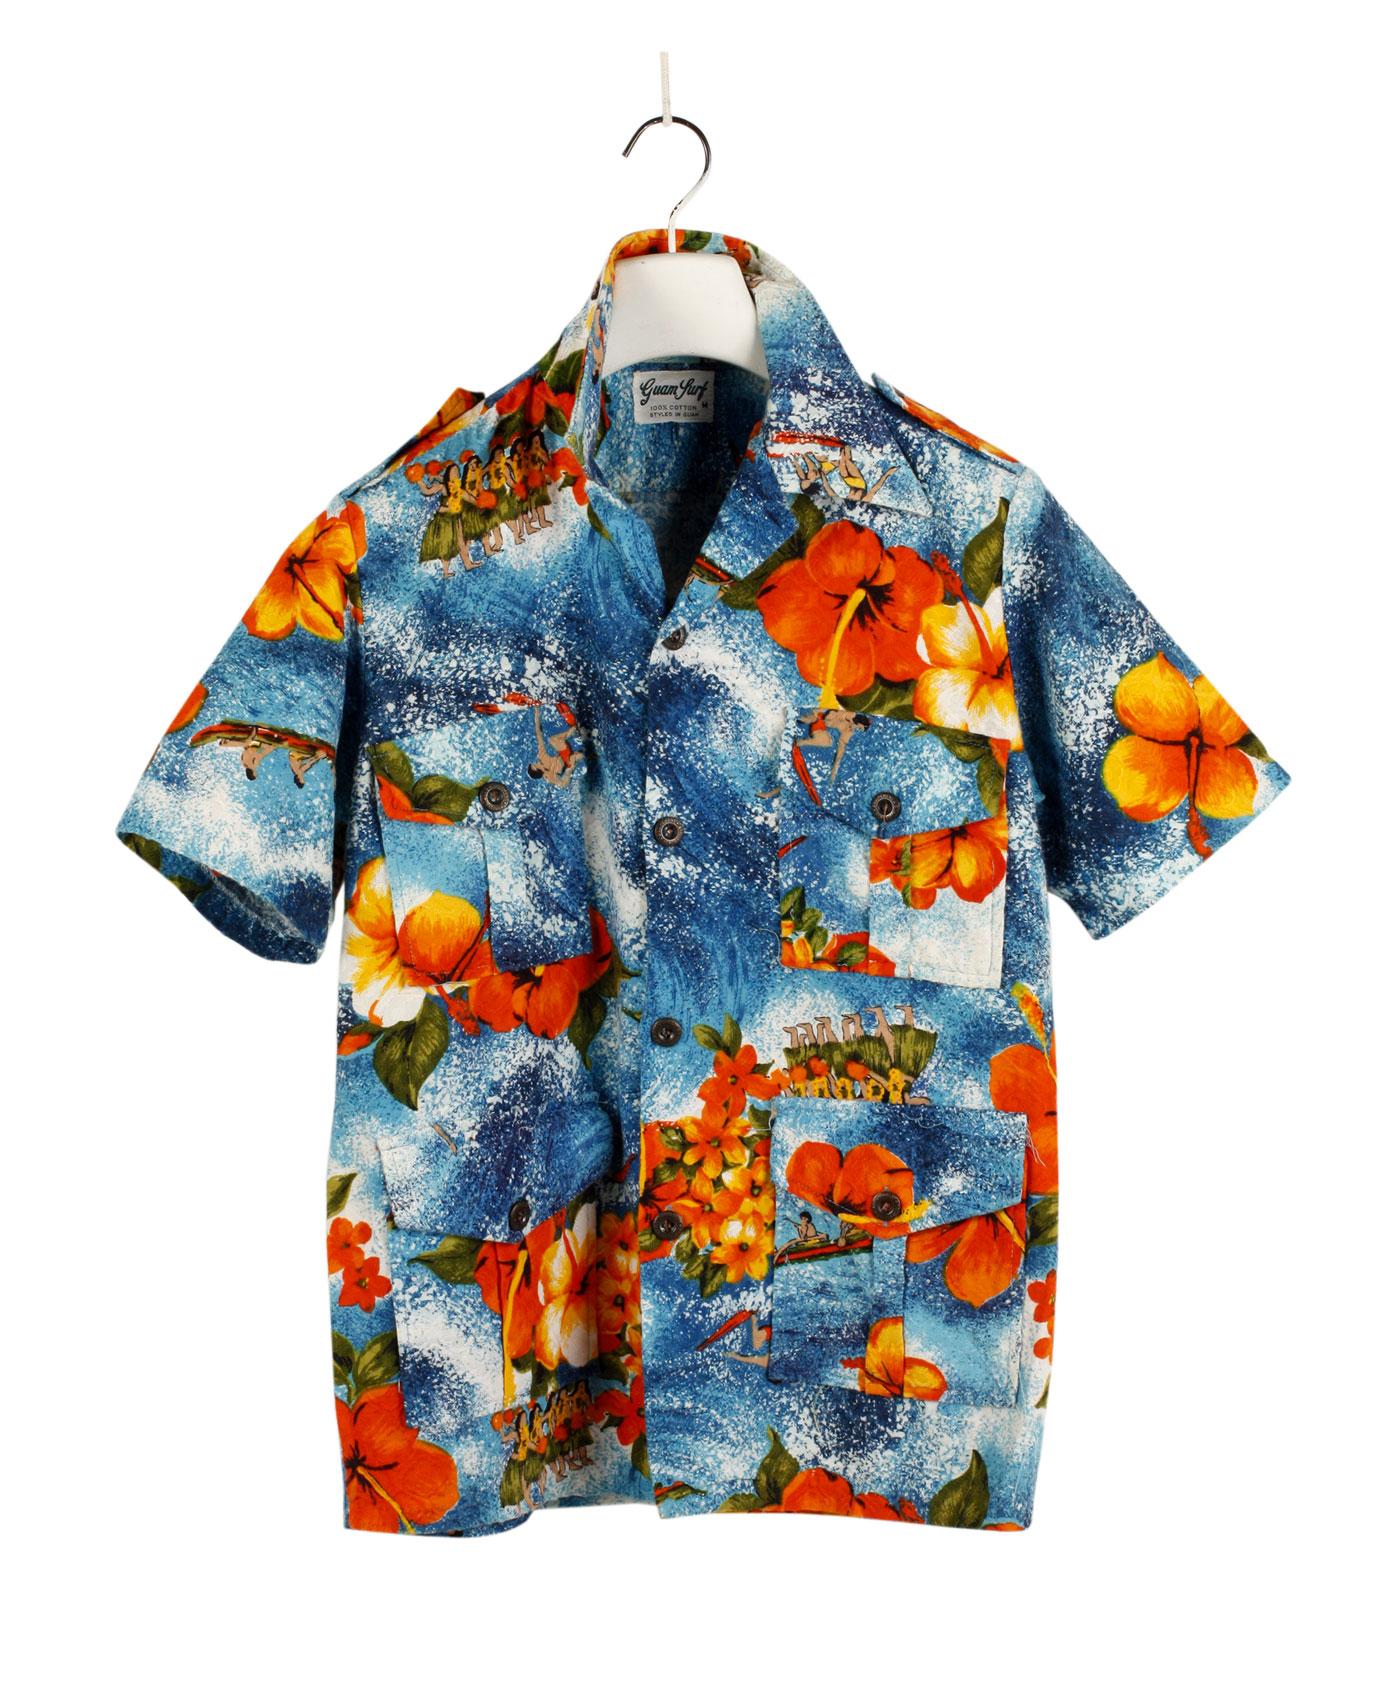 Guam surf hawaiian shirt 70s ca madeinused guam surf hawaiian shirt 70s sciox Image collections